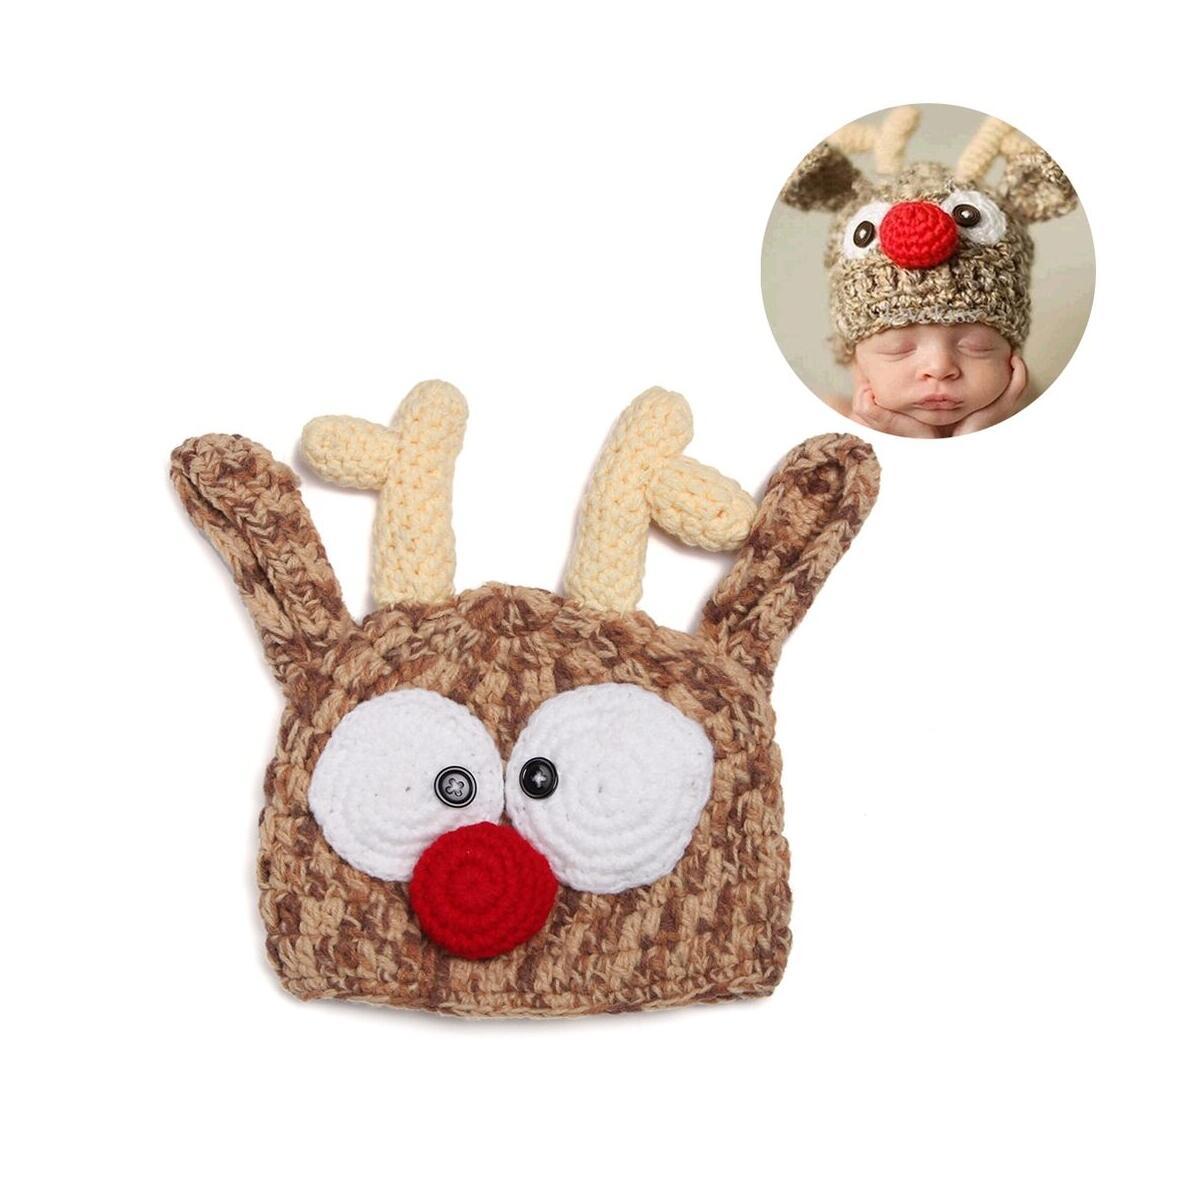 Cute Toddler Kids Girl Boy Xmas Hats Infant Baby Winter Warm Hat Beanie Cap Deer Pattern Hat